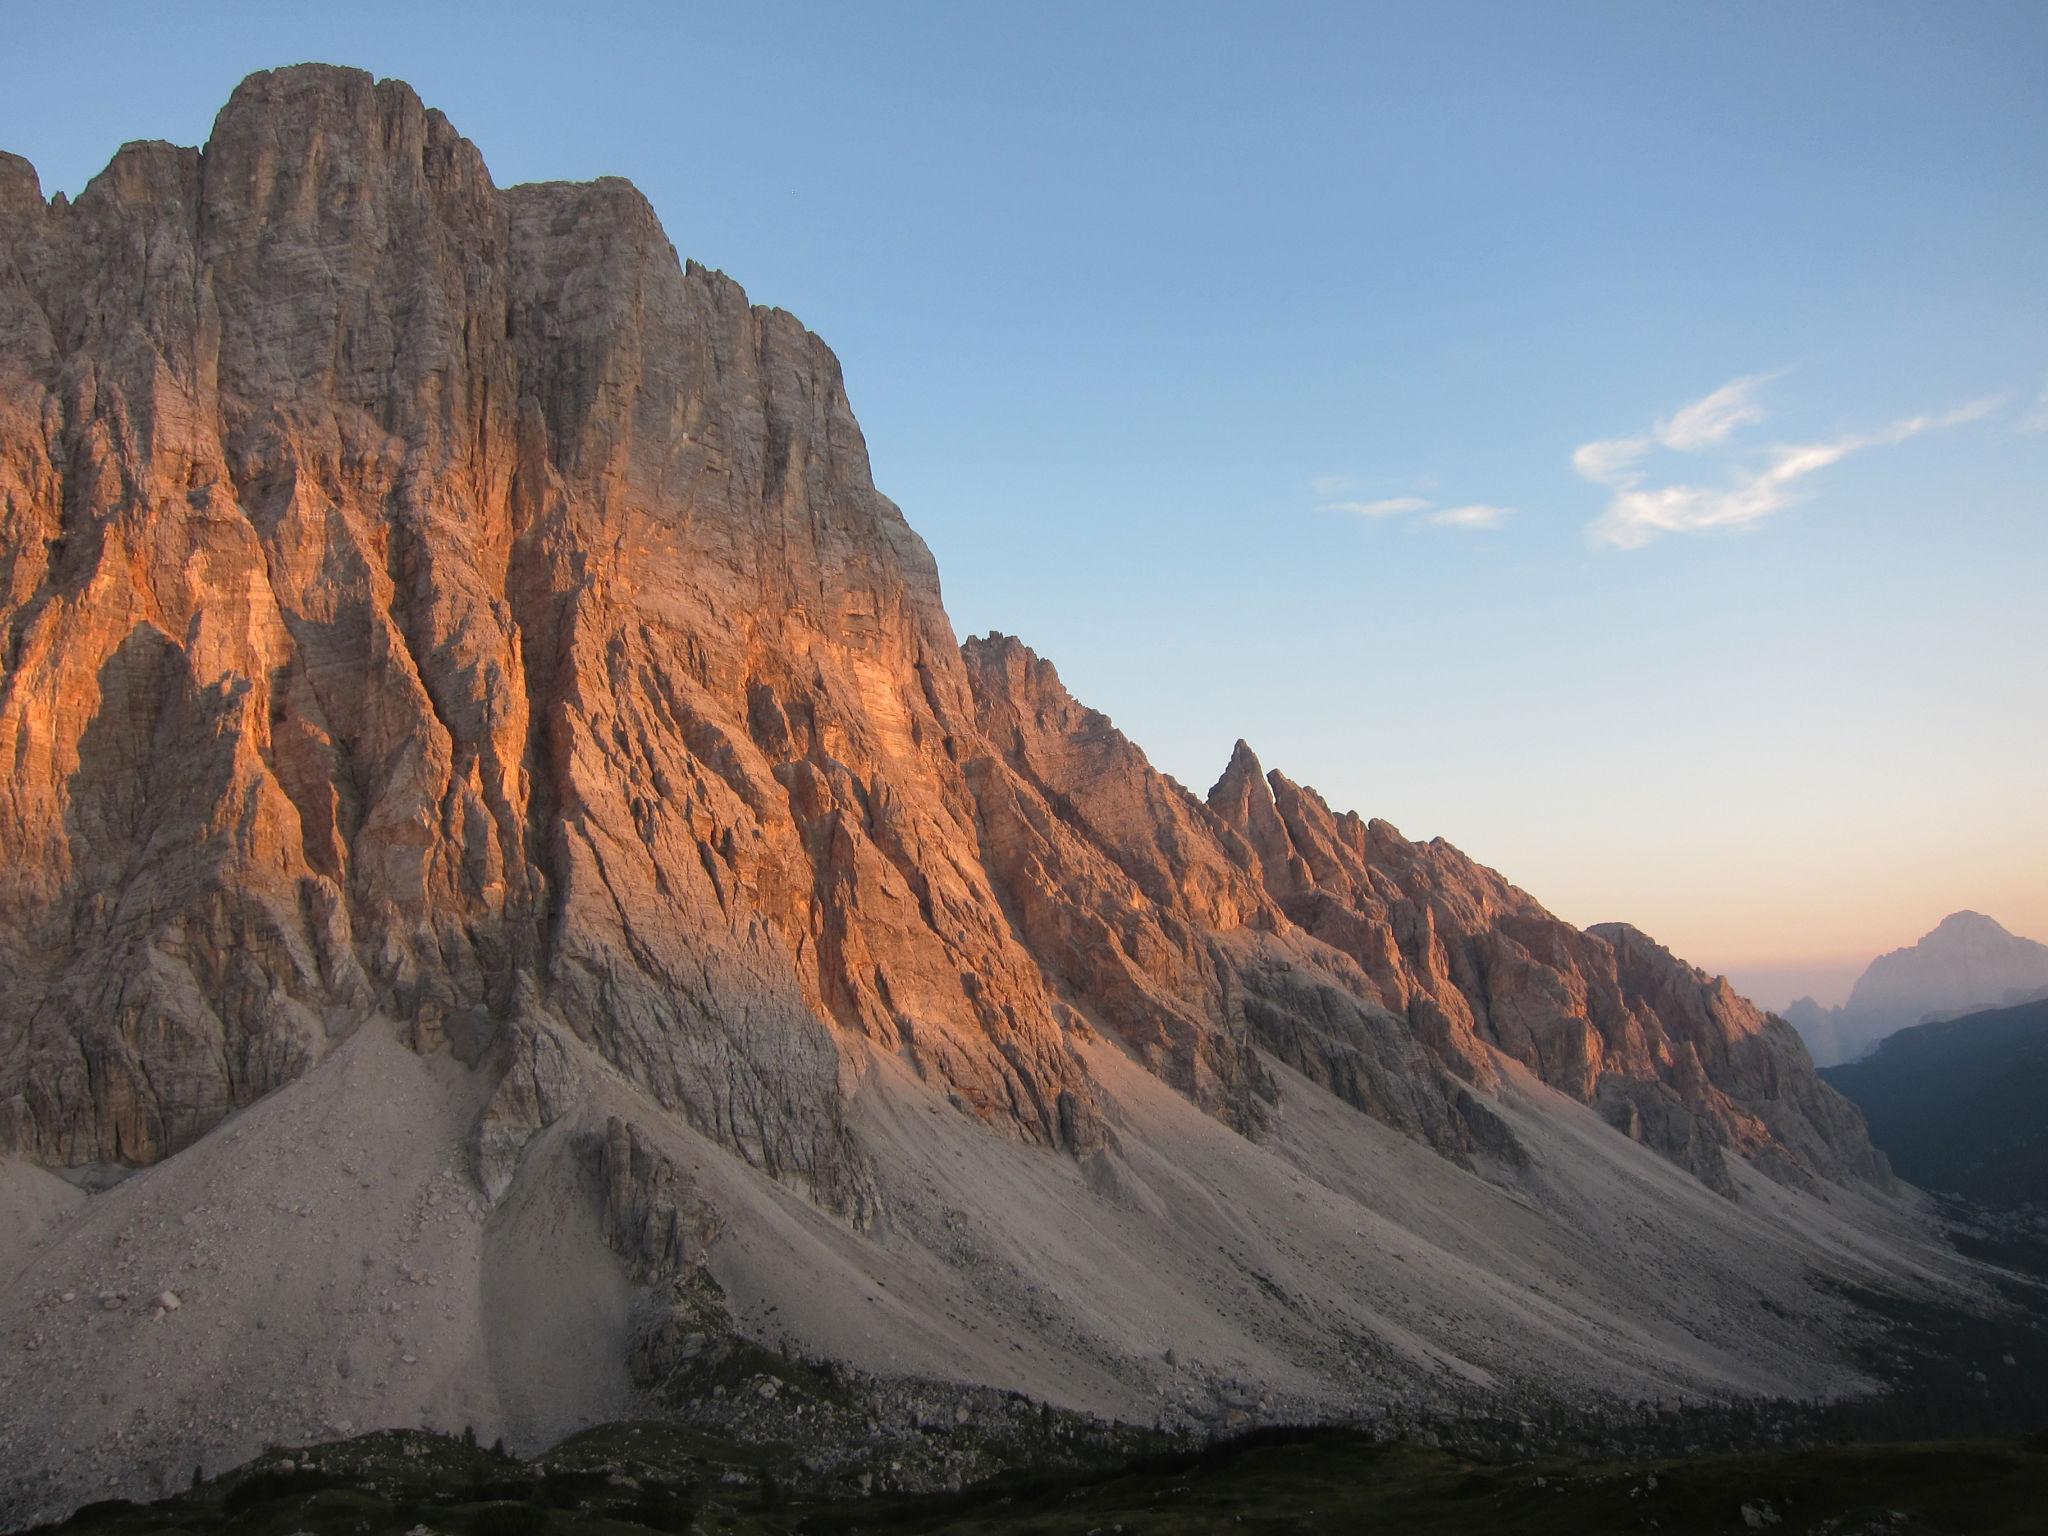 Italië - Te voet over de Alpen, etappe 4